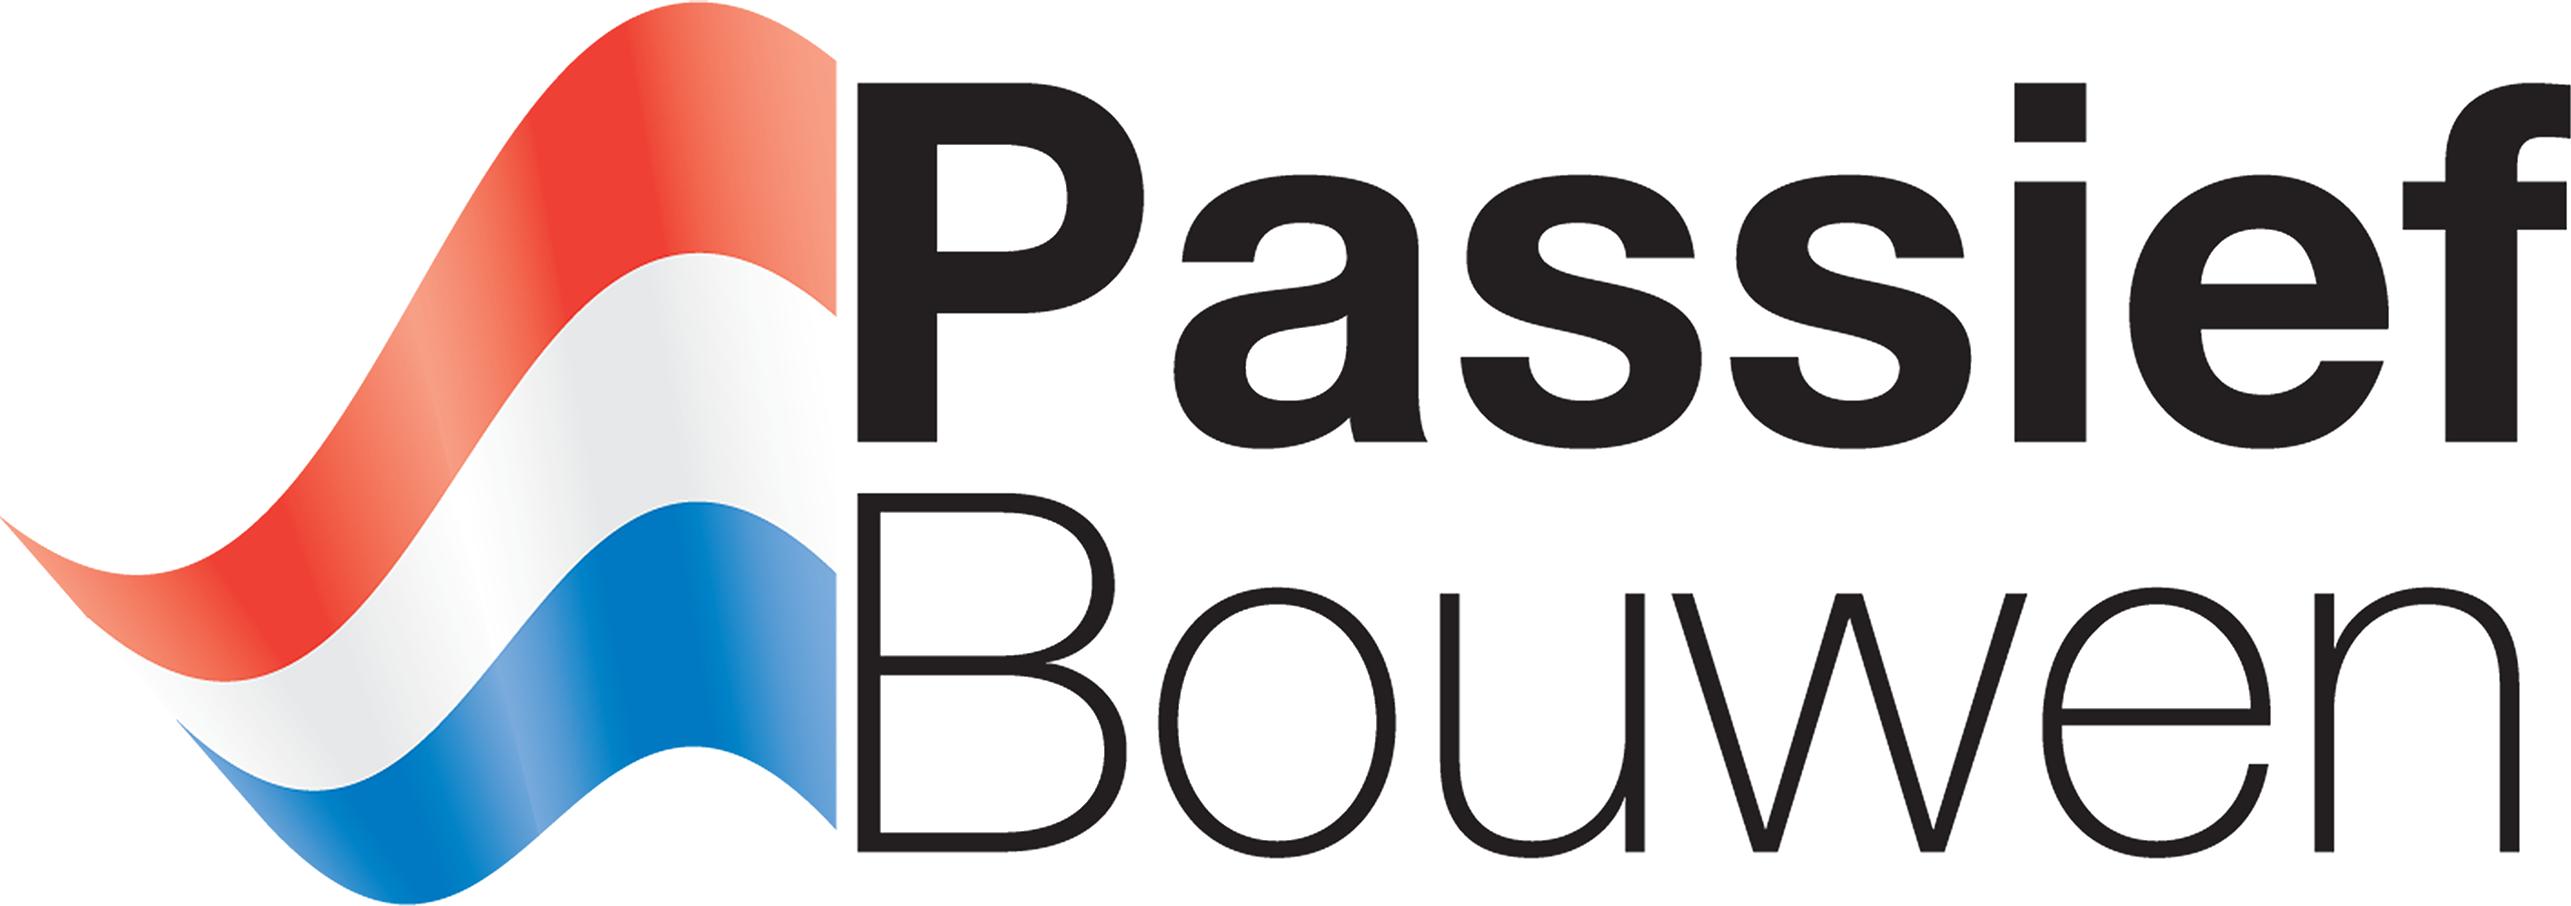 PassiveHouse Premium Etten-Leur